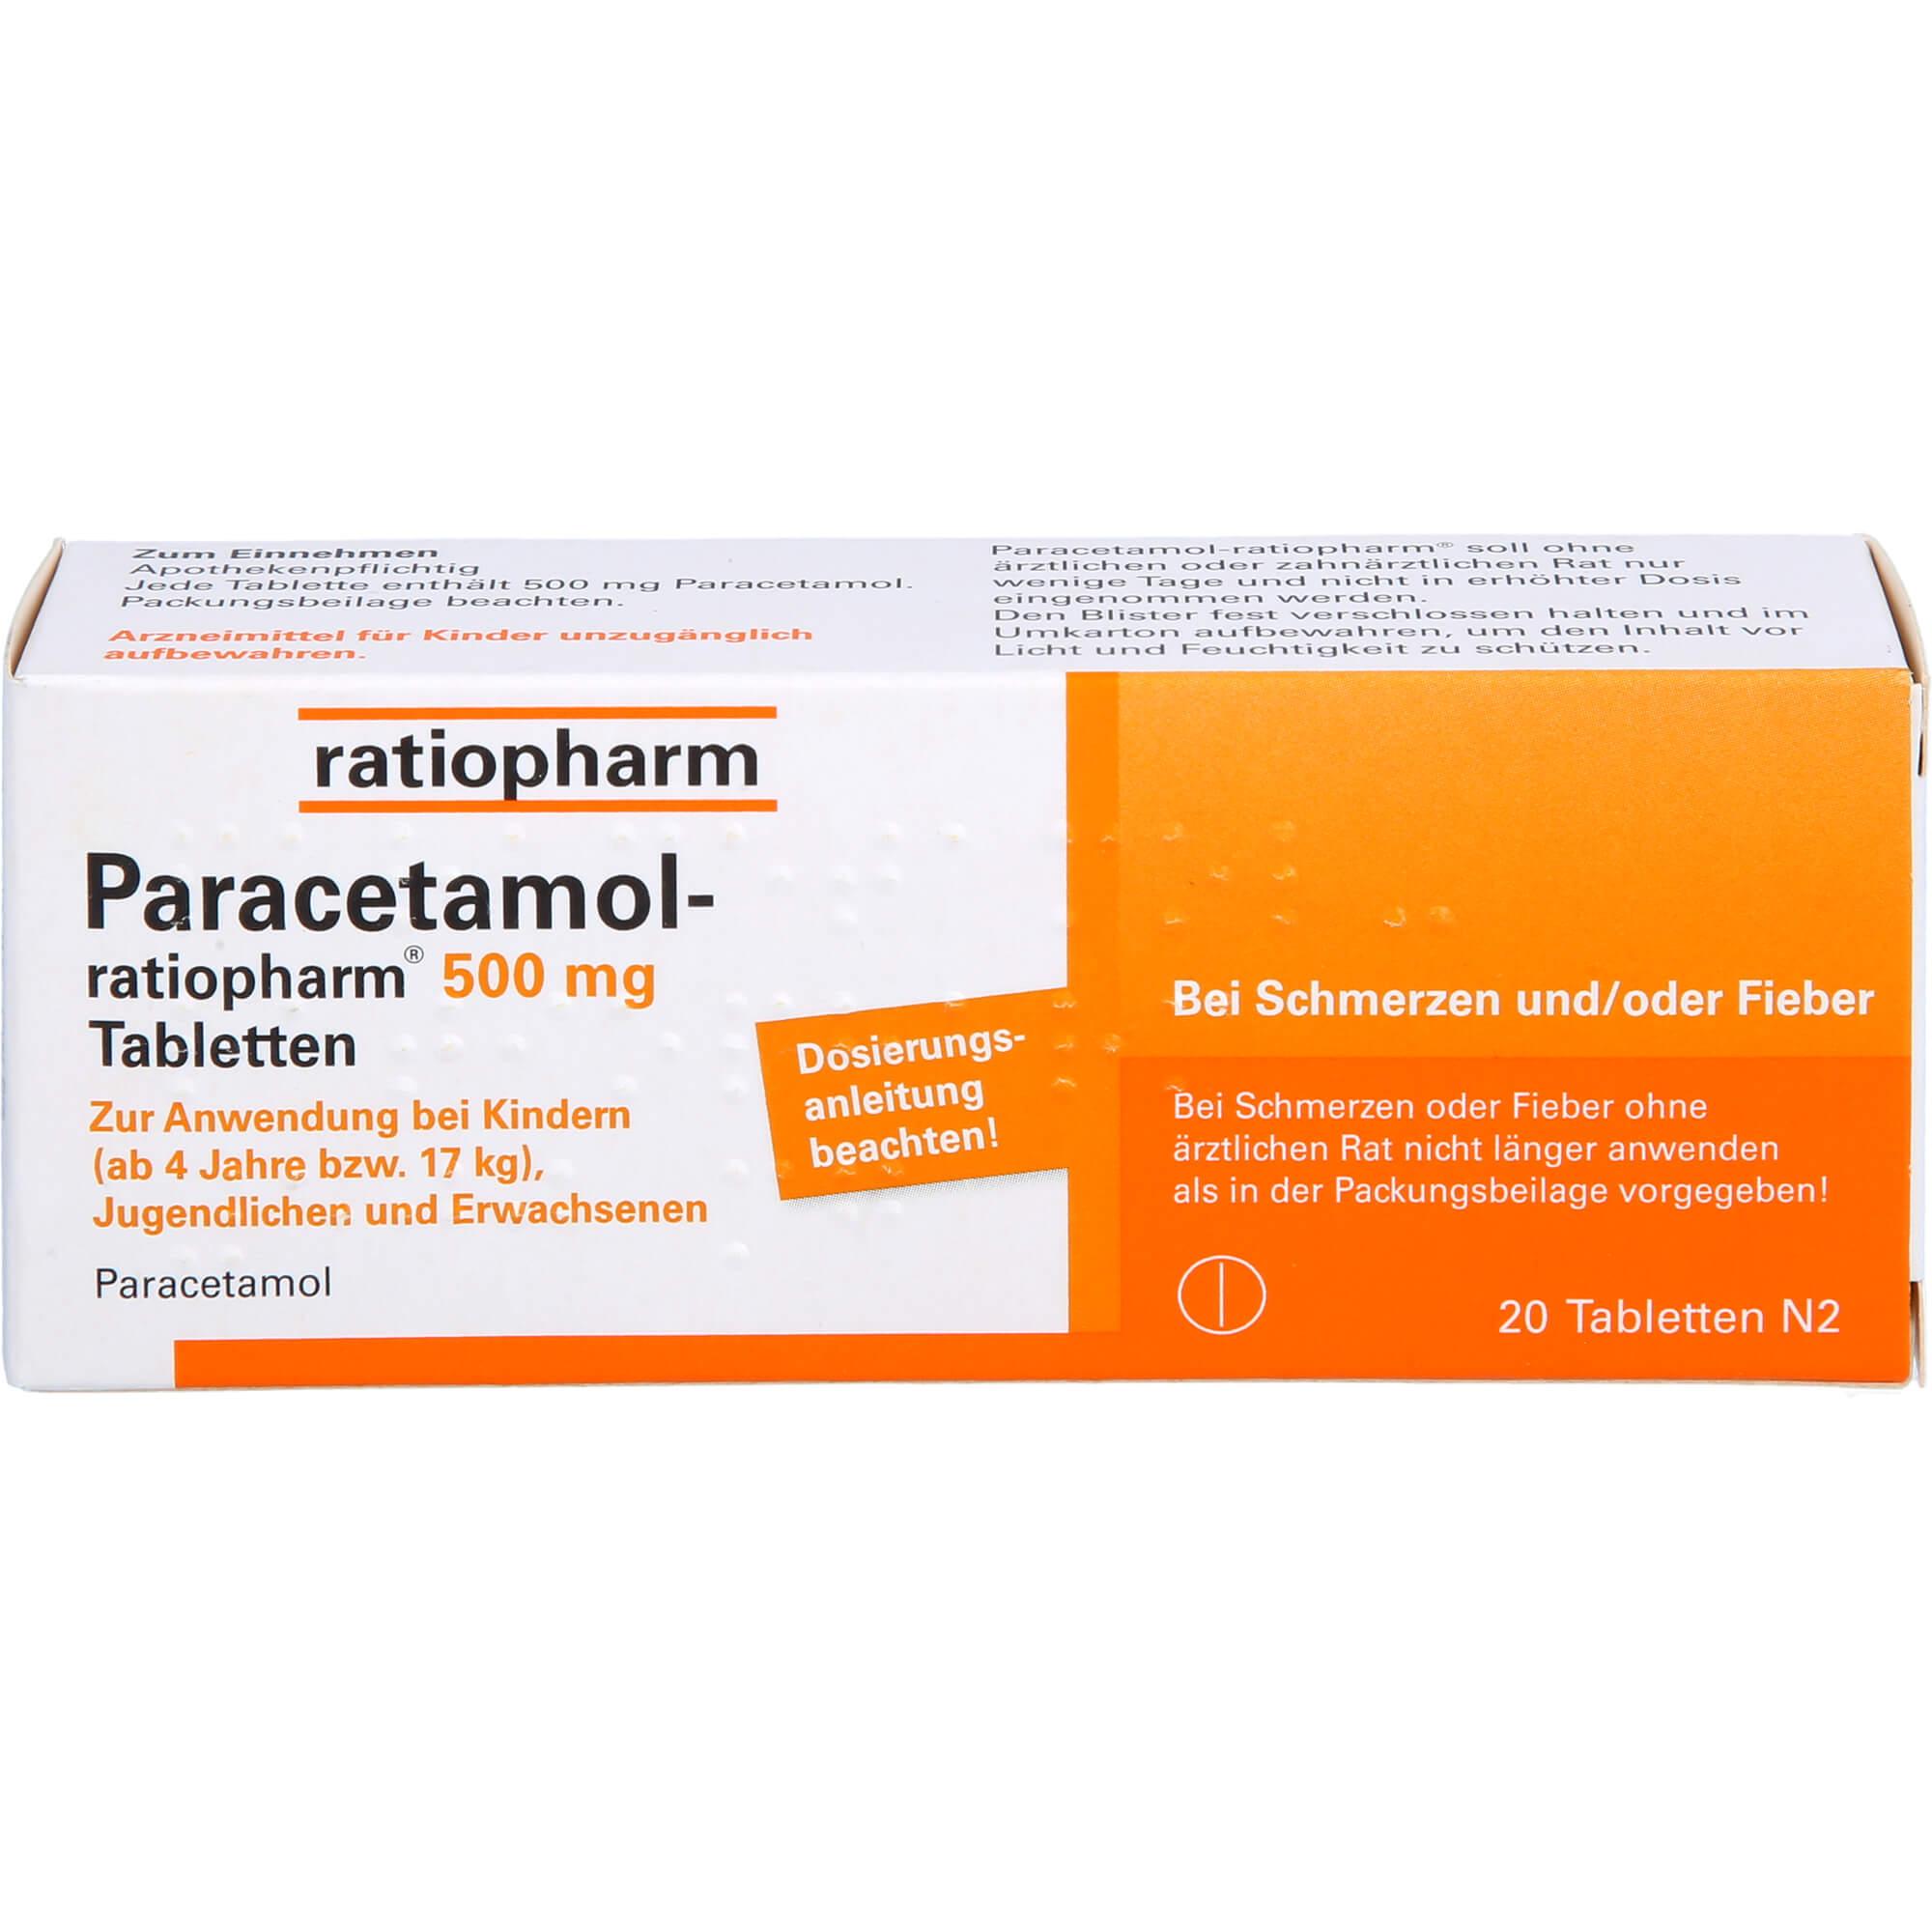 PARACETAMOL-ratiopharm-500-mg-Tabletten